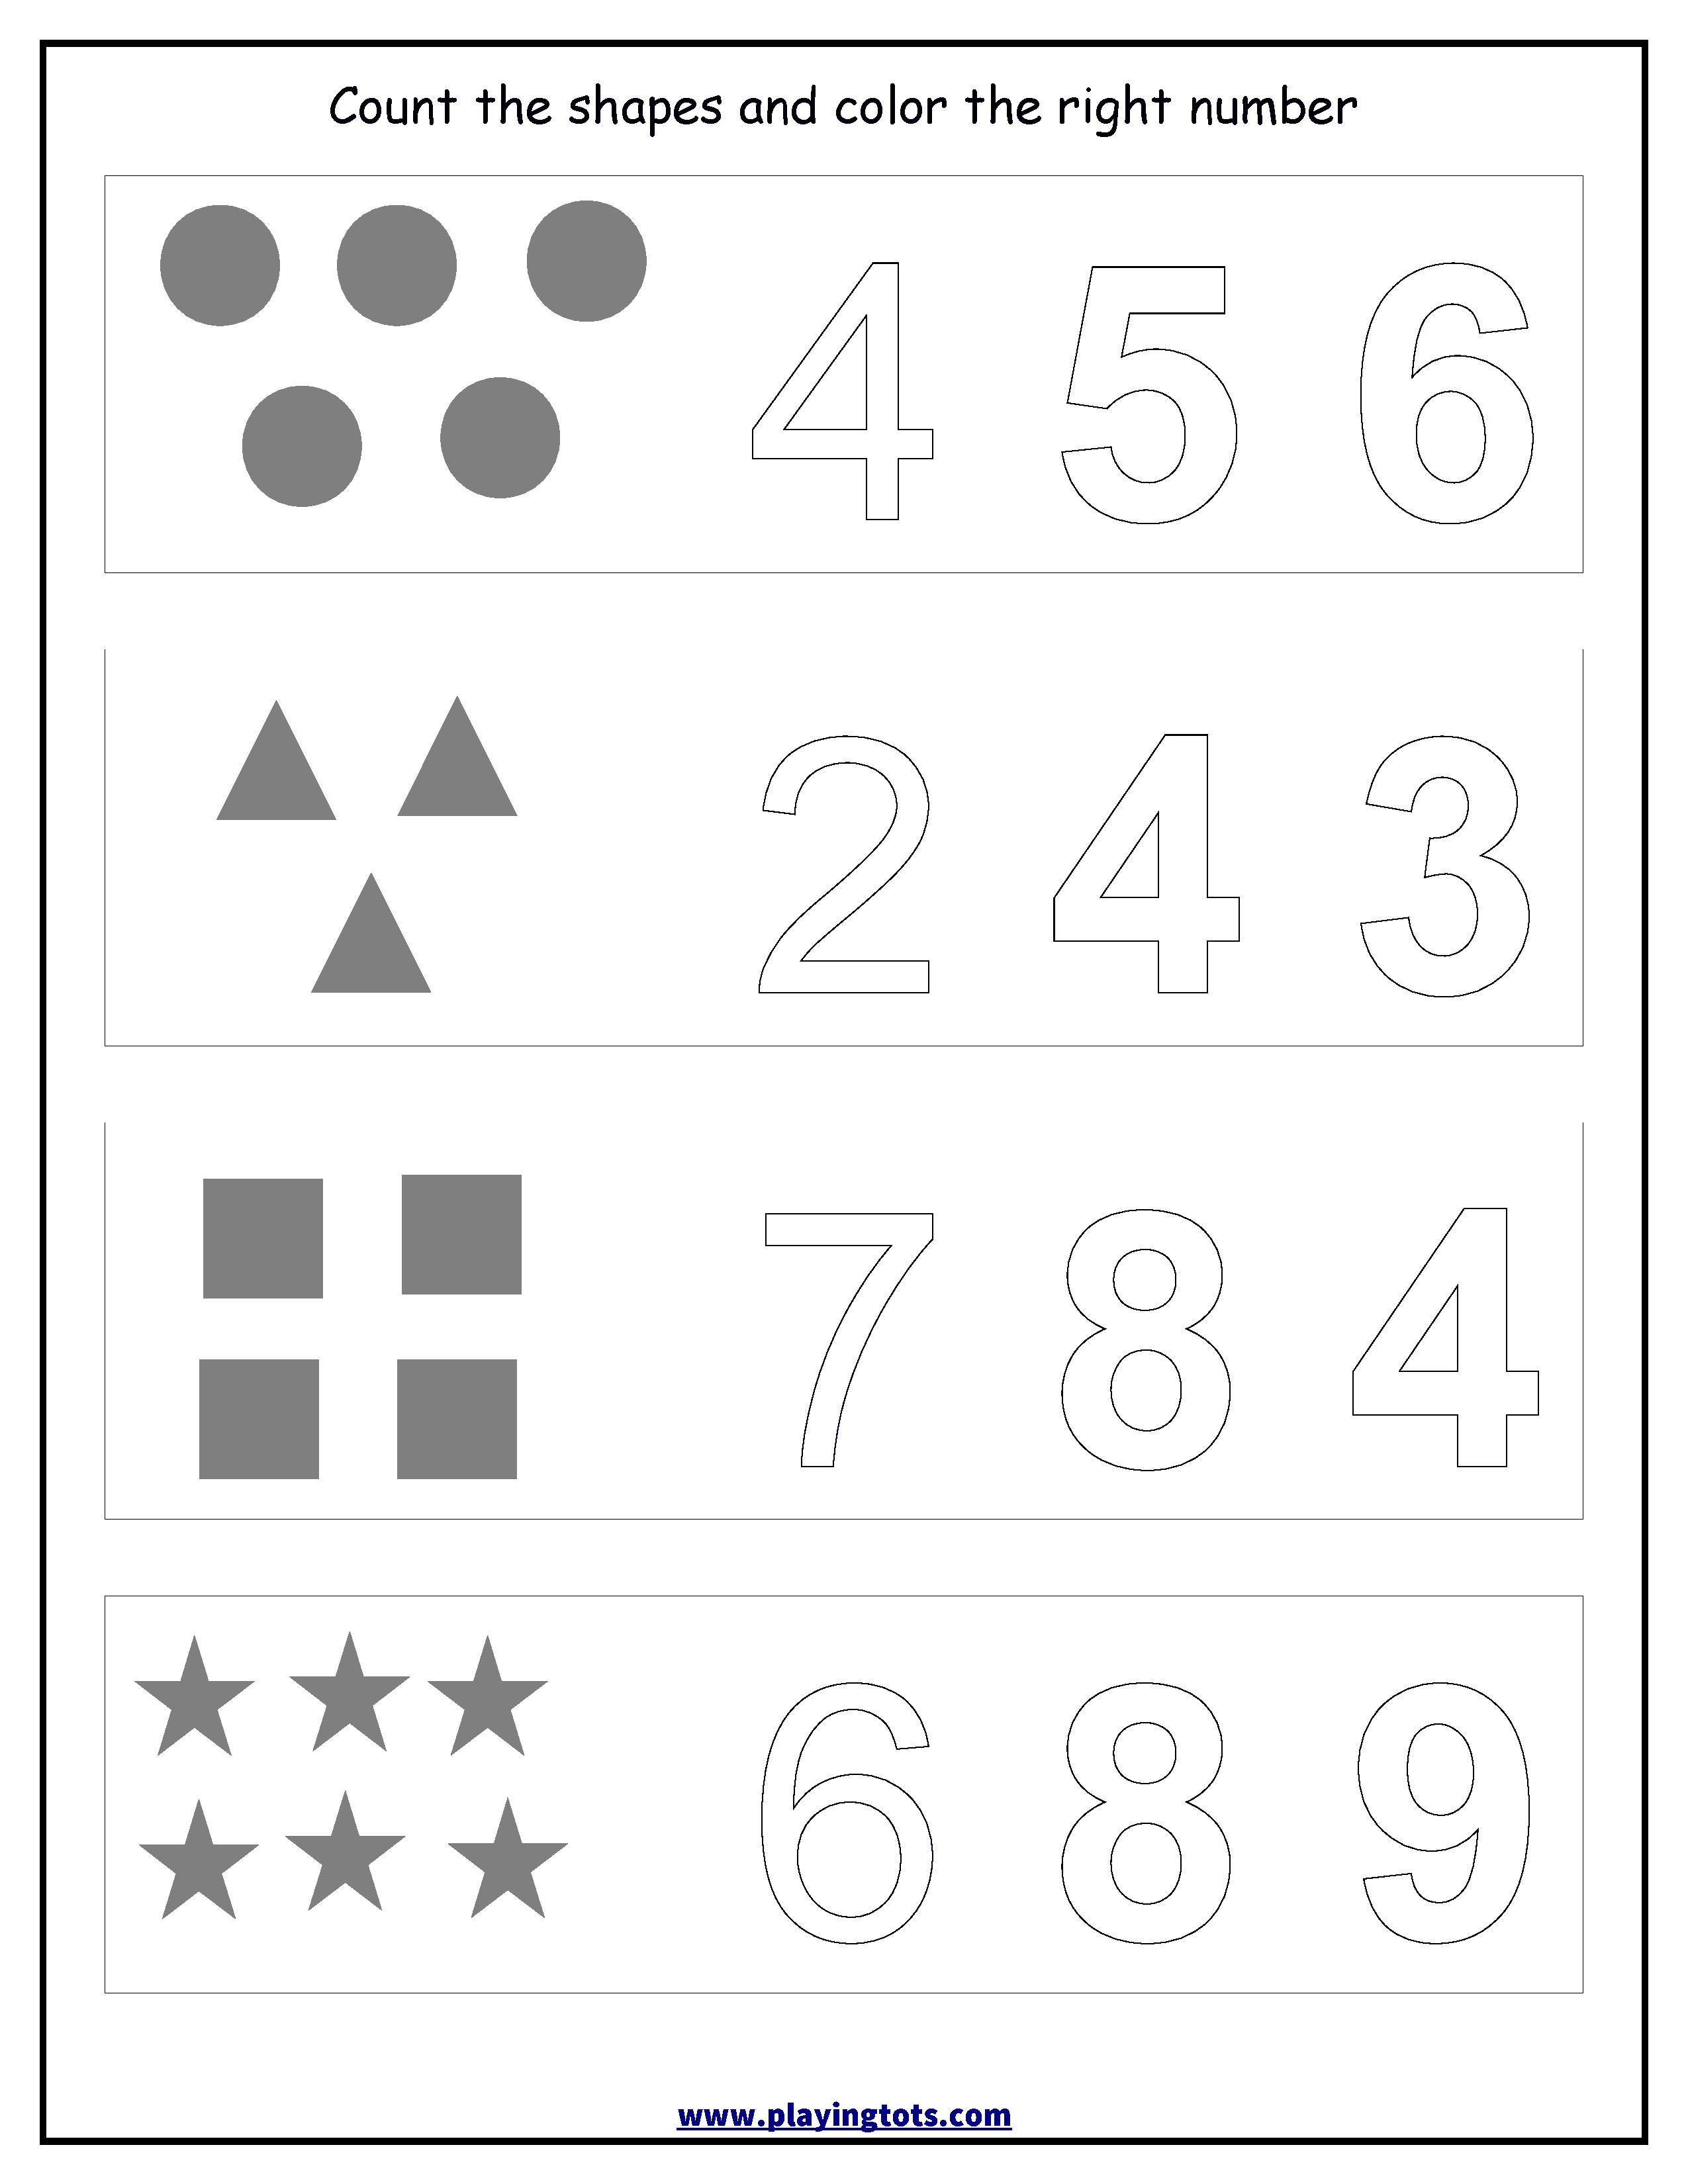 Worksheet - Counting Shapes,coloring Numbers Keywords:free | Free Printable Worksheets For Kindergarten Pdf